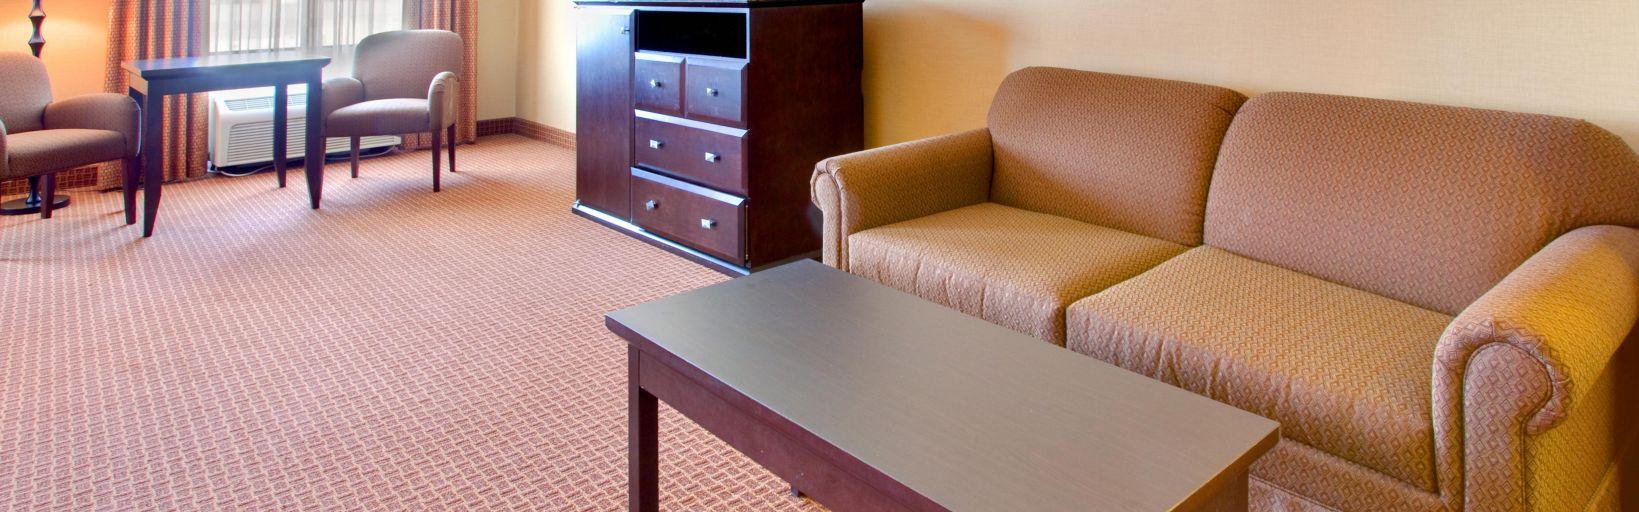 Holiday Inn La Mesa Hotels | Holiday Inn San Diego - La Mesa | Hotel ...